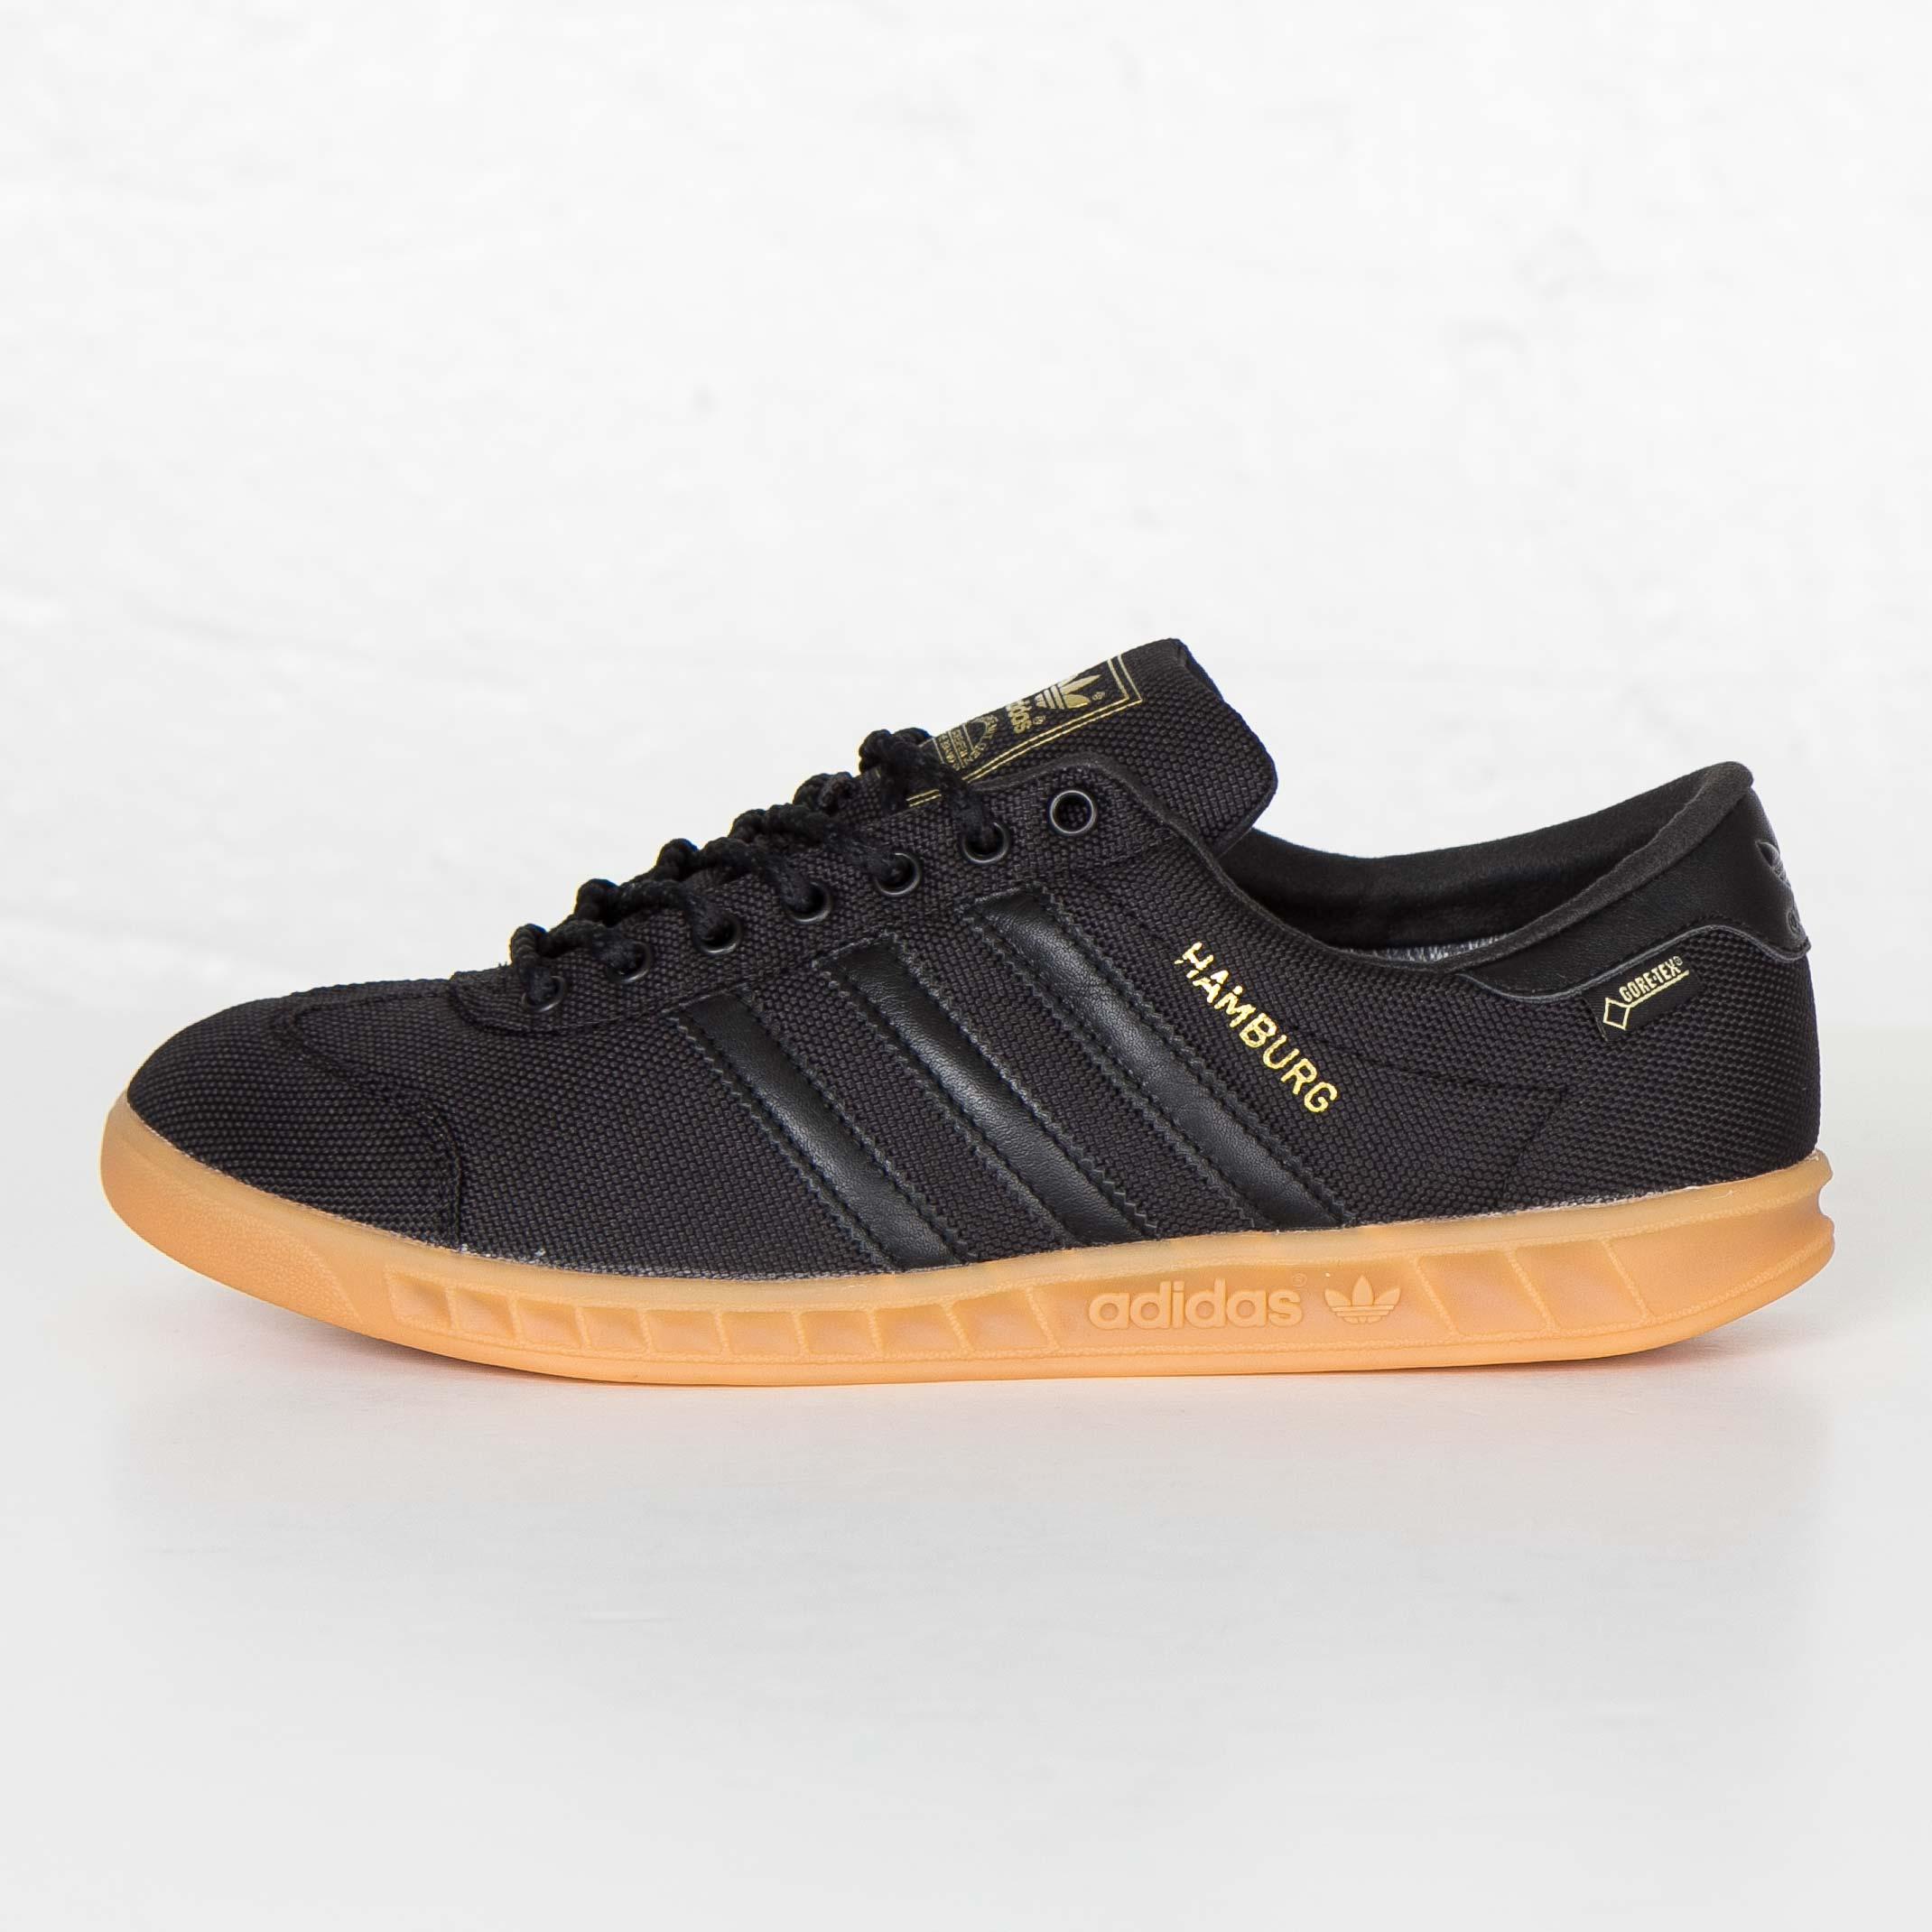 adidas Hamburg GTX - S77293 - SNS | sneakers & streetwear online ...